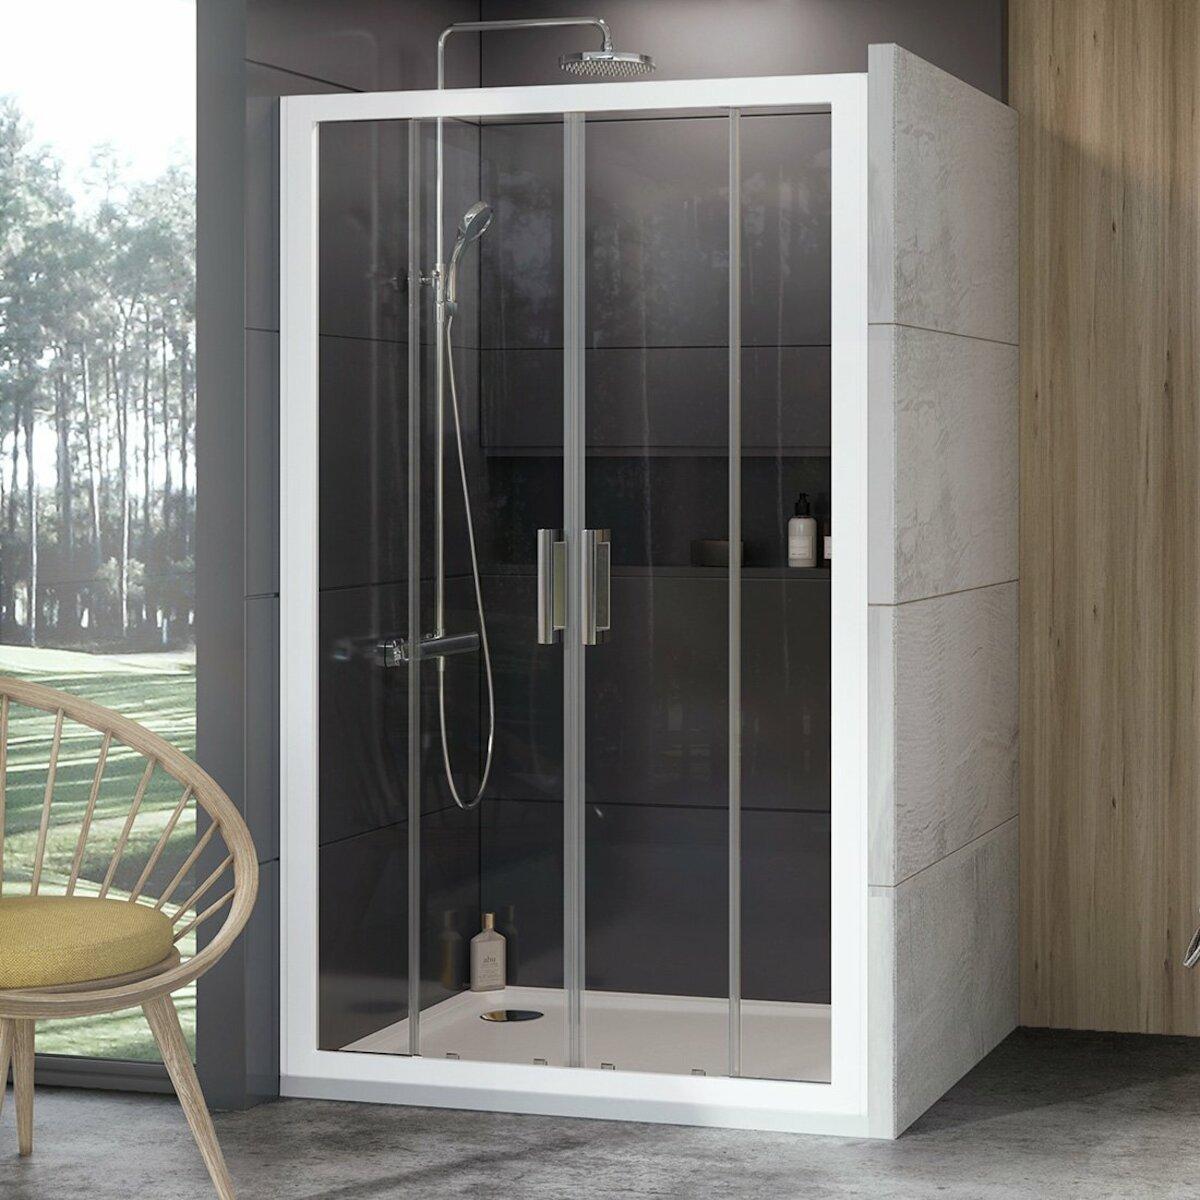 Sprchové dvere 170x190 cm Ravak 10° biela 0ZKV0100Z1